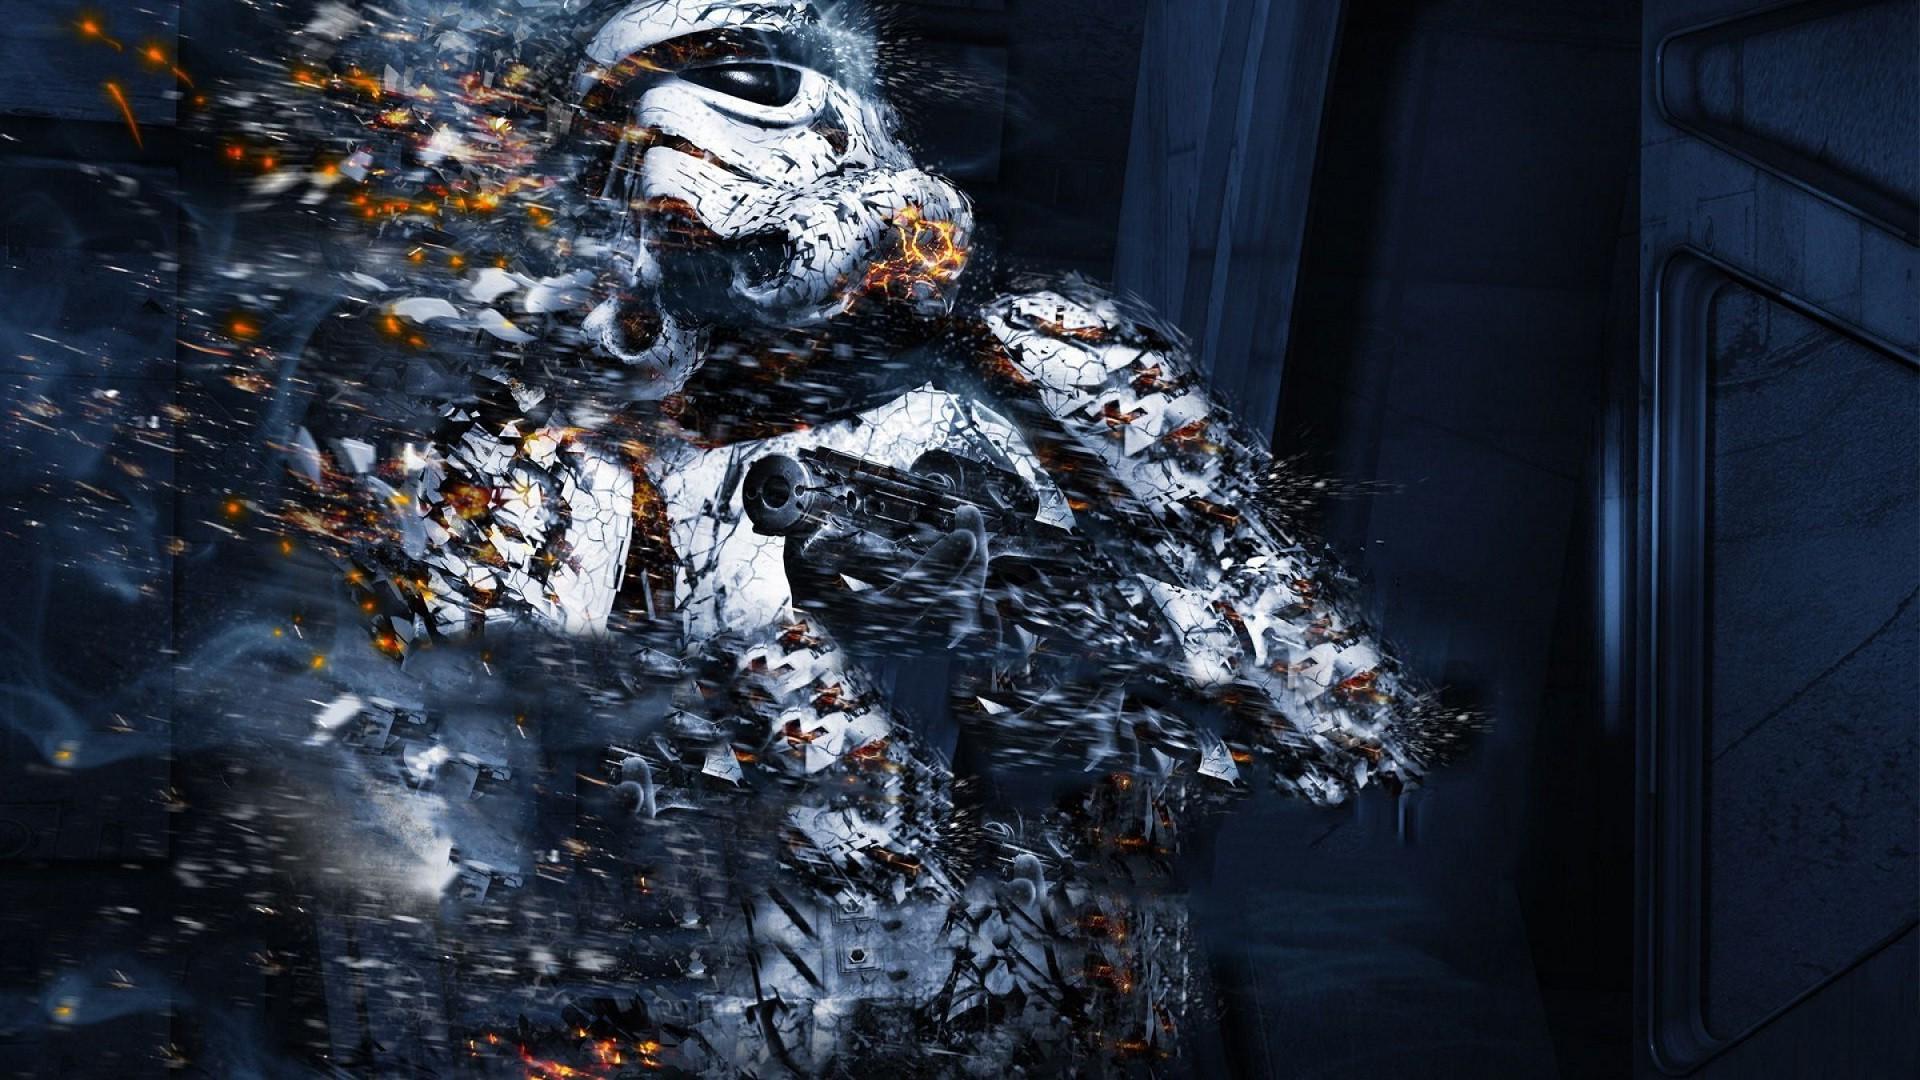 Star Wars gun water winter weapon stormtrooper ART darkness 1920x1080 px computer wallpaper